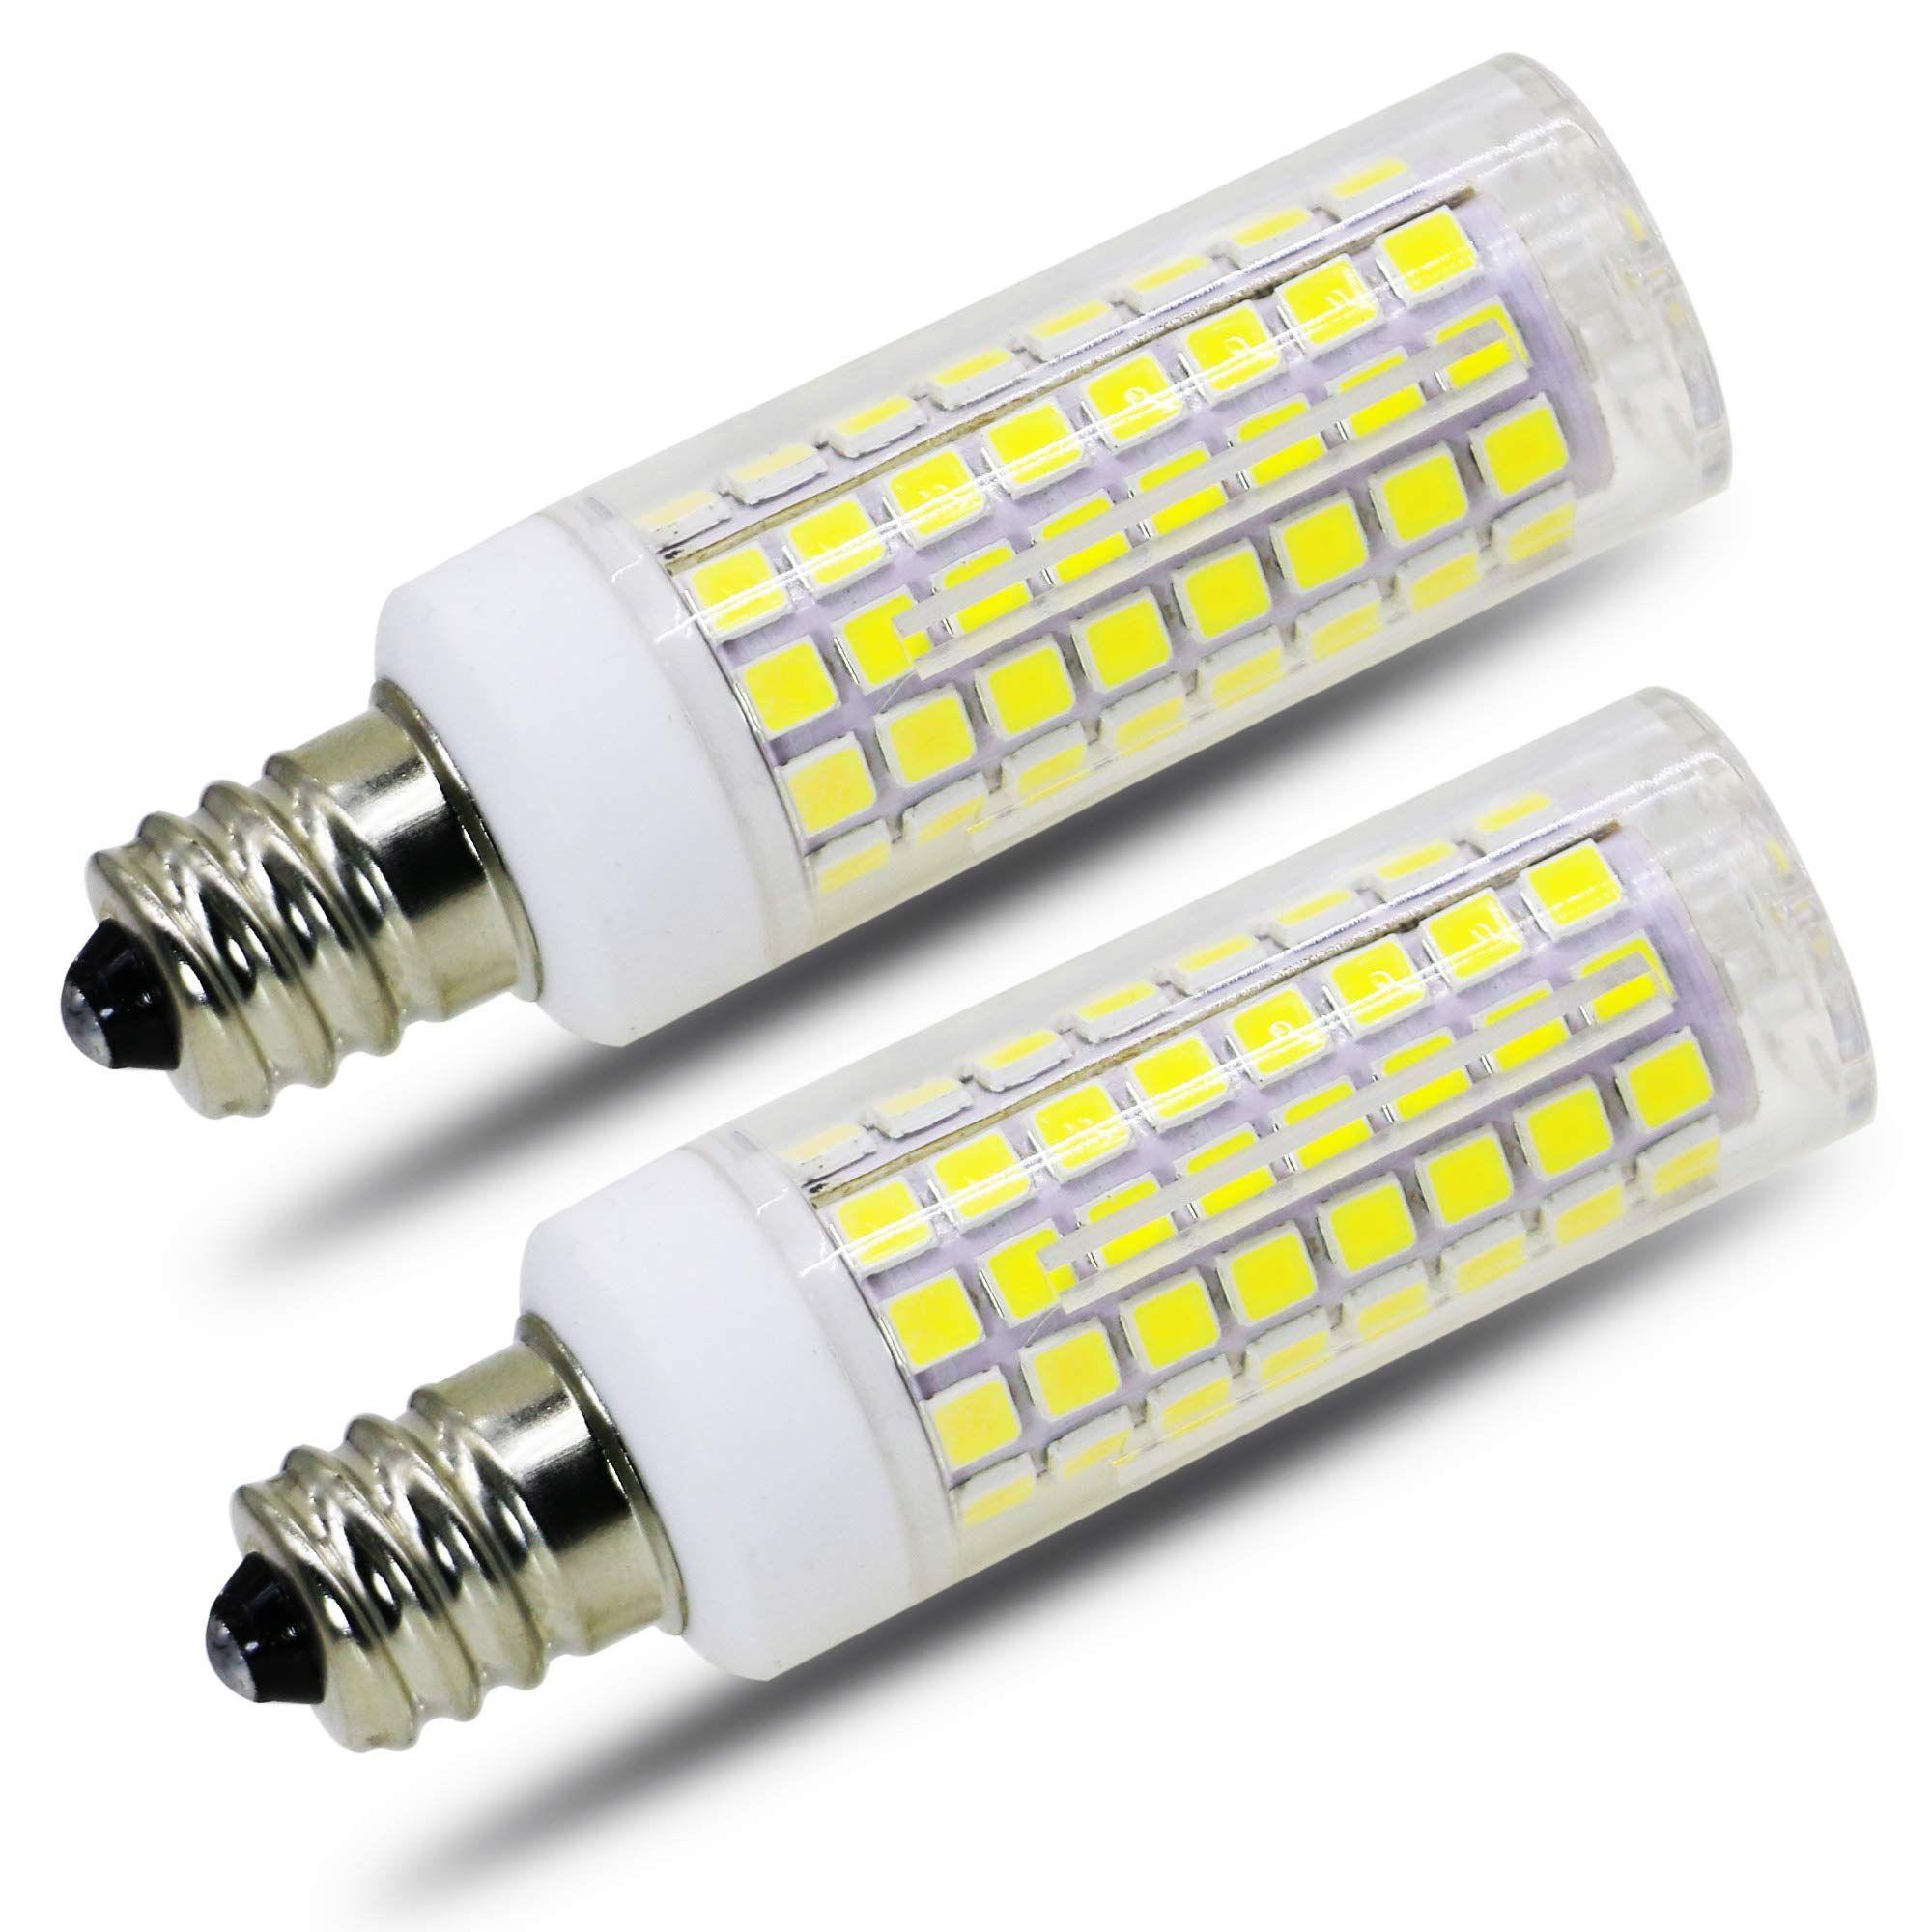 E12 Led Bulb Candelabra Light Bulbs 8w 100w 850lm Equivalent Ceiling